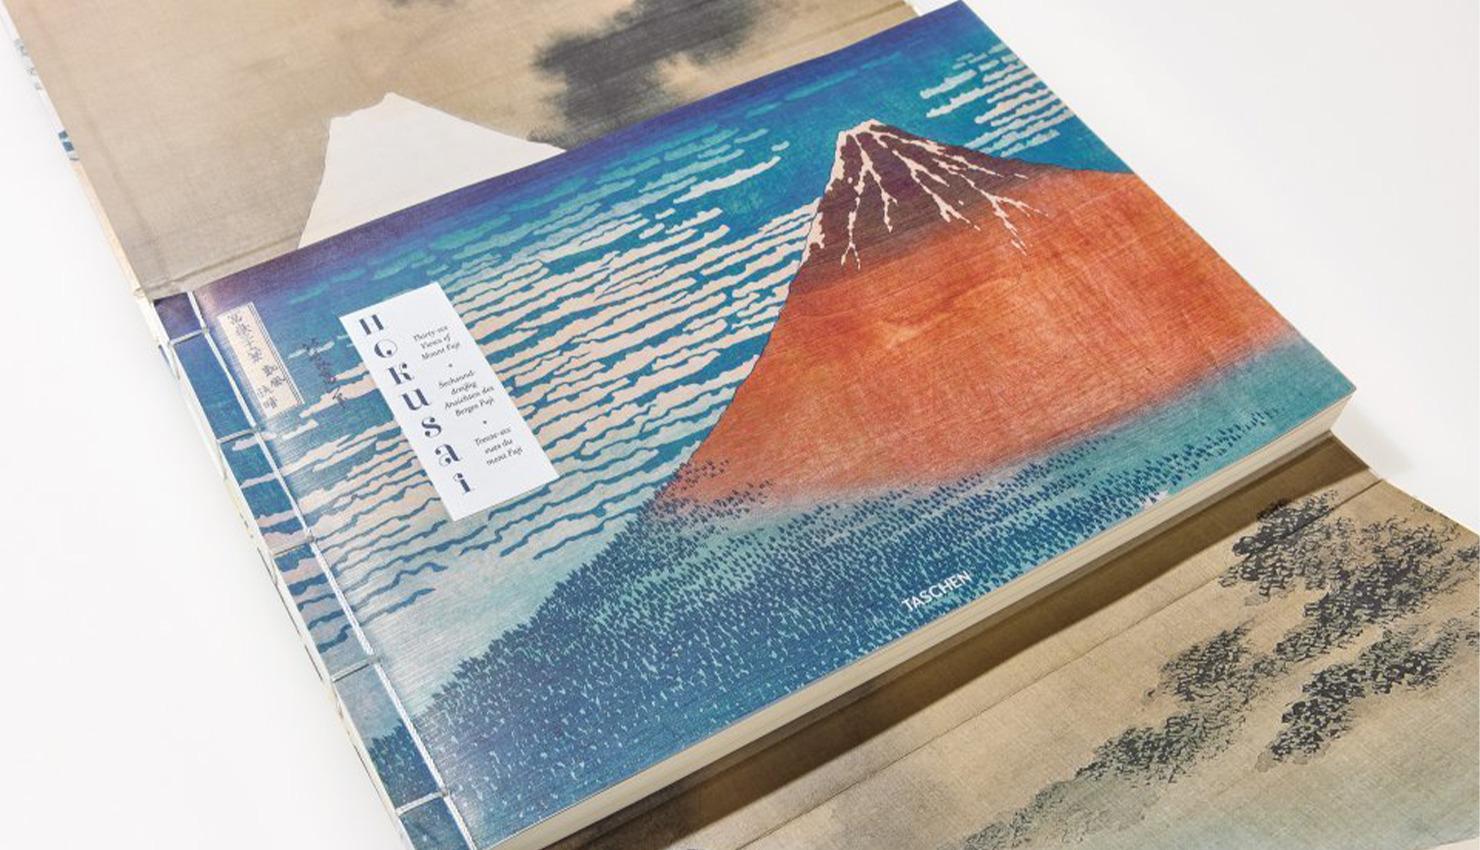 hokusai-libros-fuji-novedades-editoriales-verano-magazinehorse